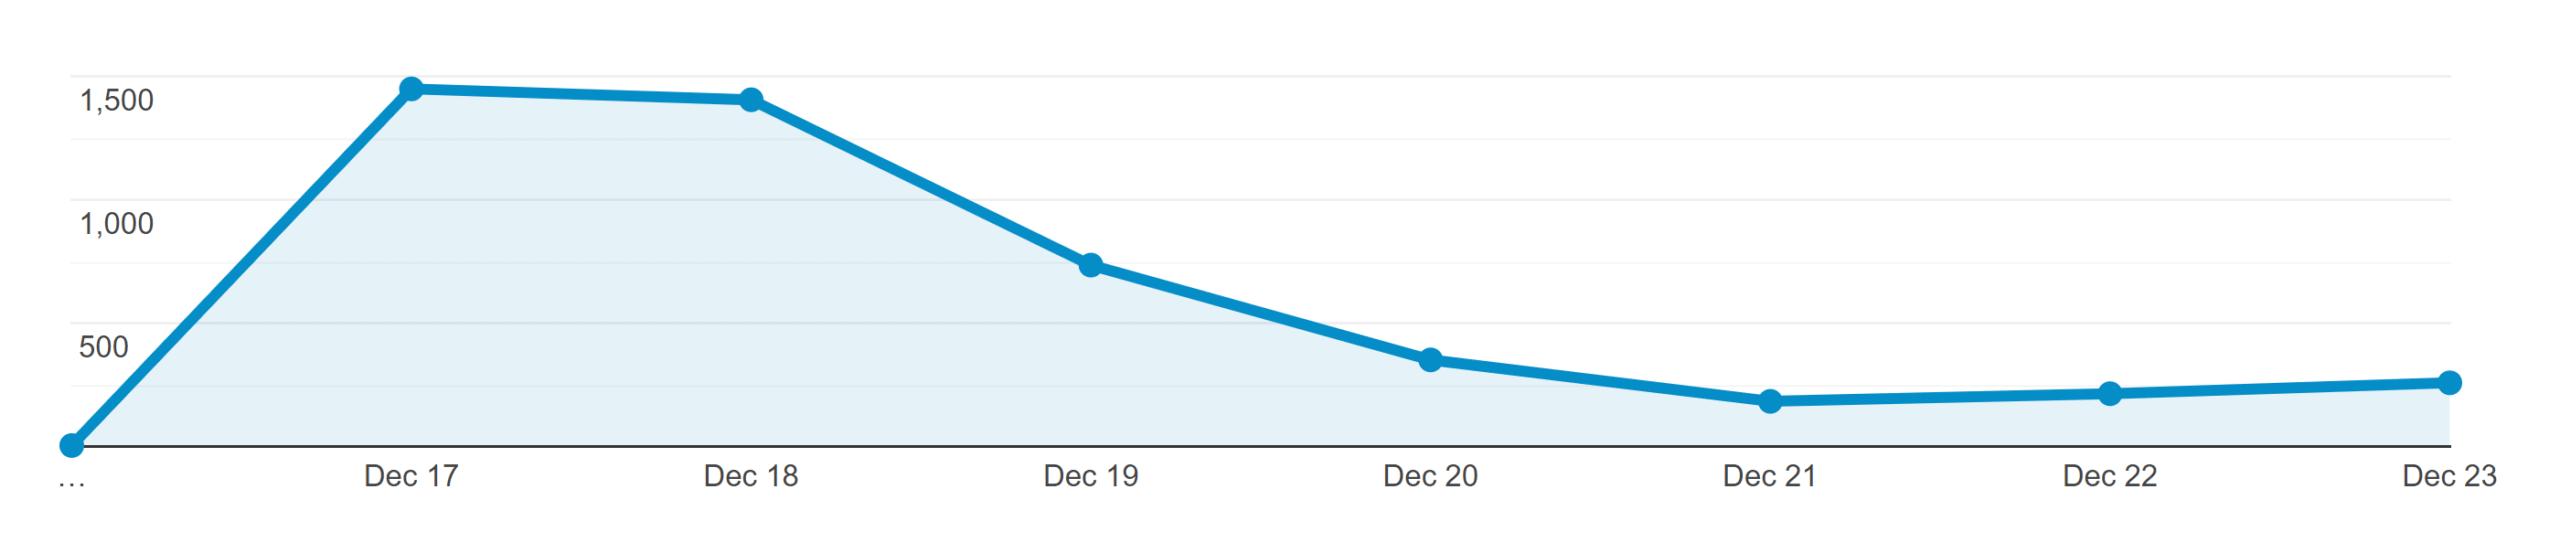 Content marketing hub – Initial traffic